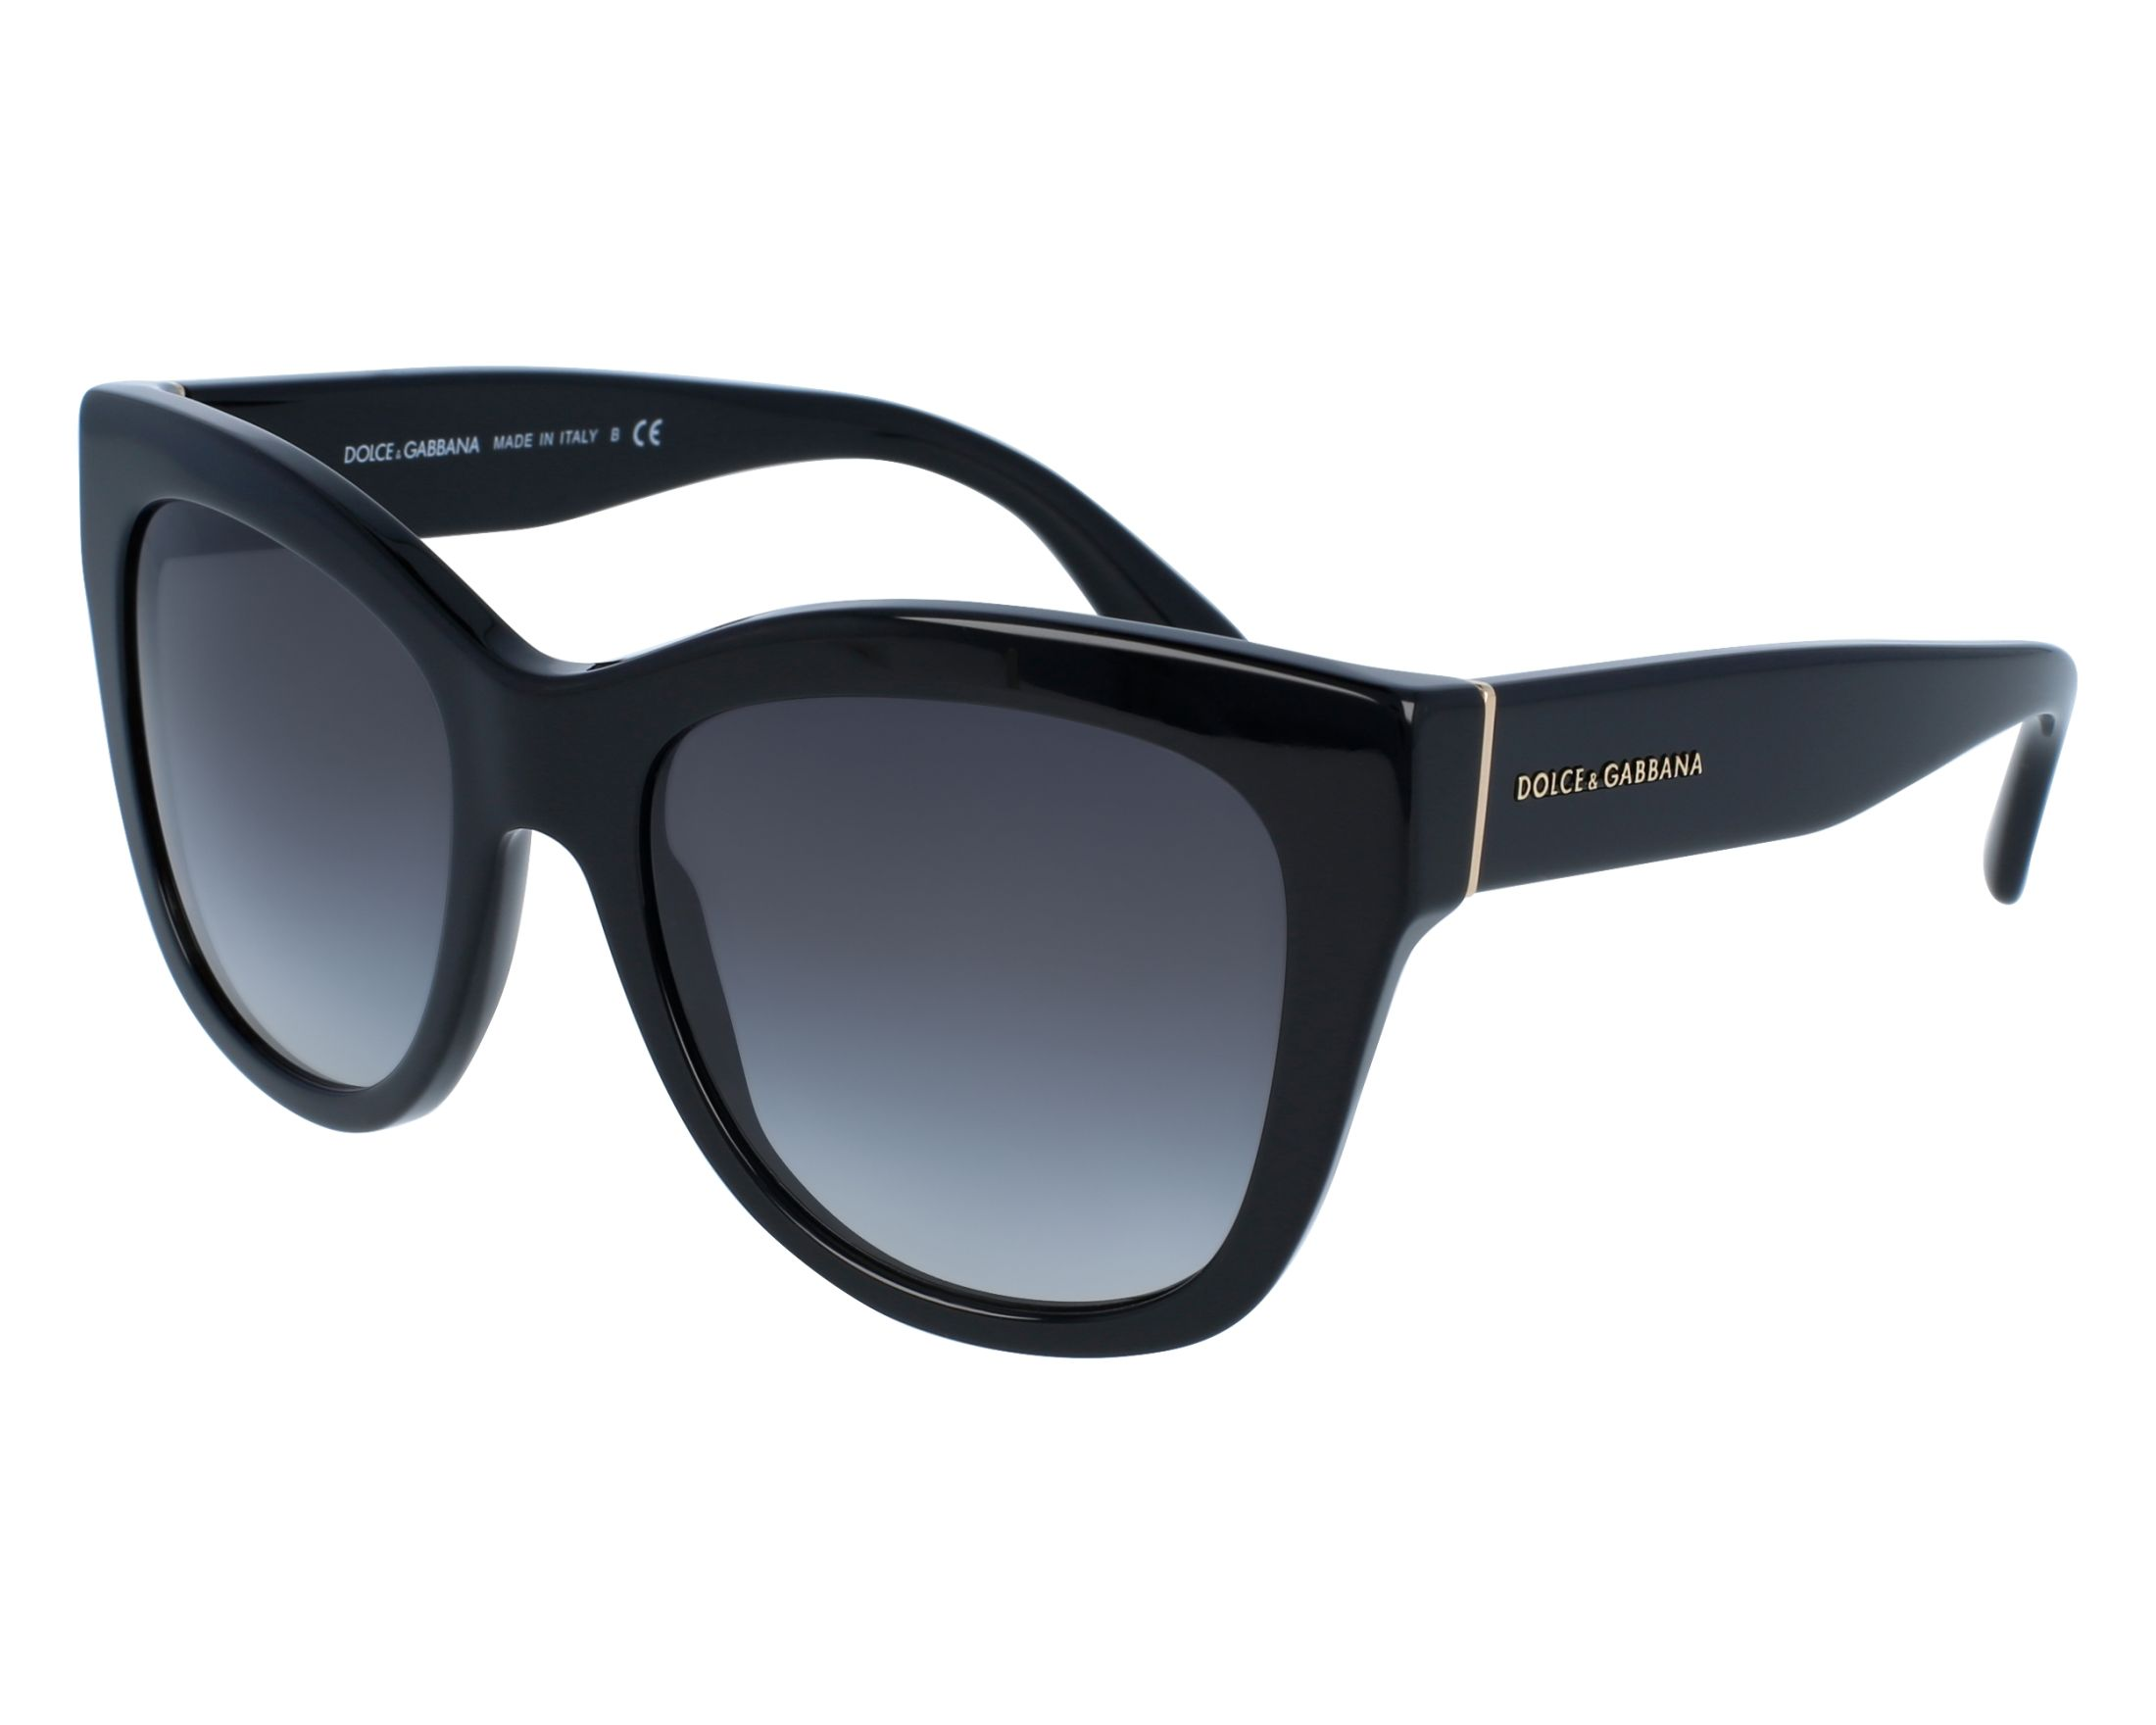 714ca5d84 thumbnail Sunglasses Dolce & Gabbana DG-4270 501/8G - Black front view